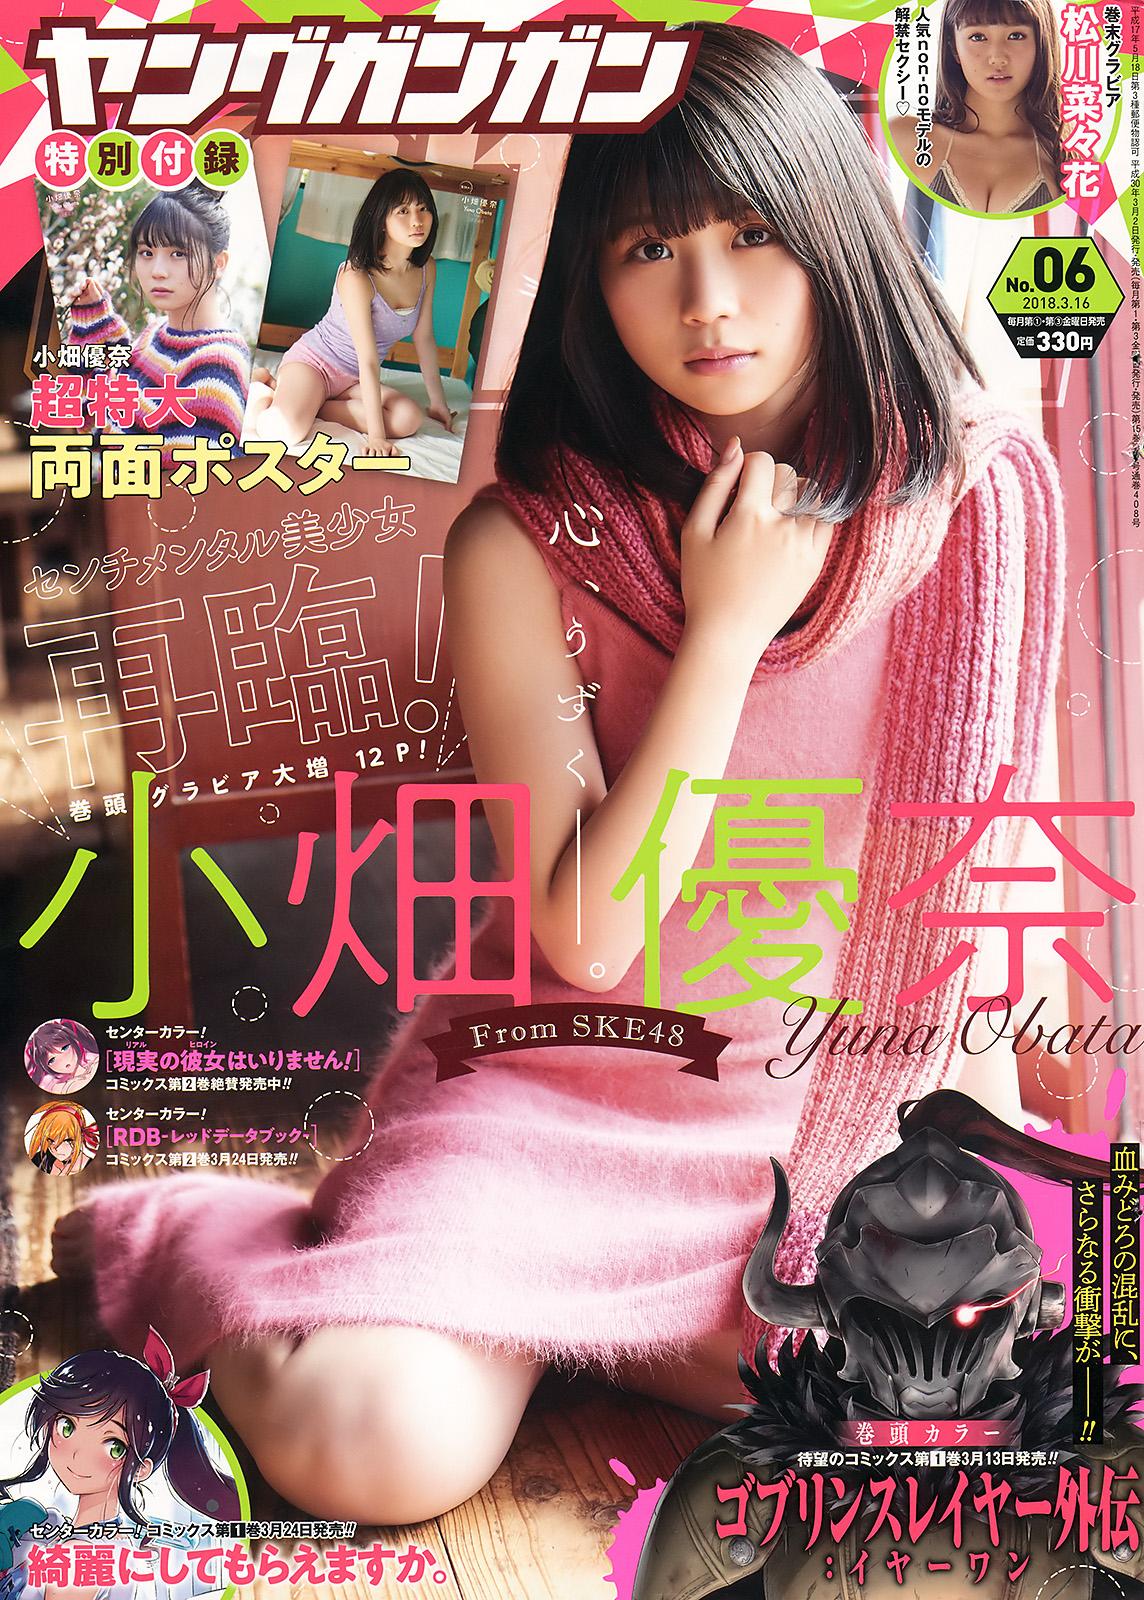 [Young Gangan] 2018 No.06 - Japanese Gravure Idol Young Gangan Obata Yuna Japanese Girls Japanese gravure